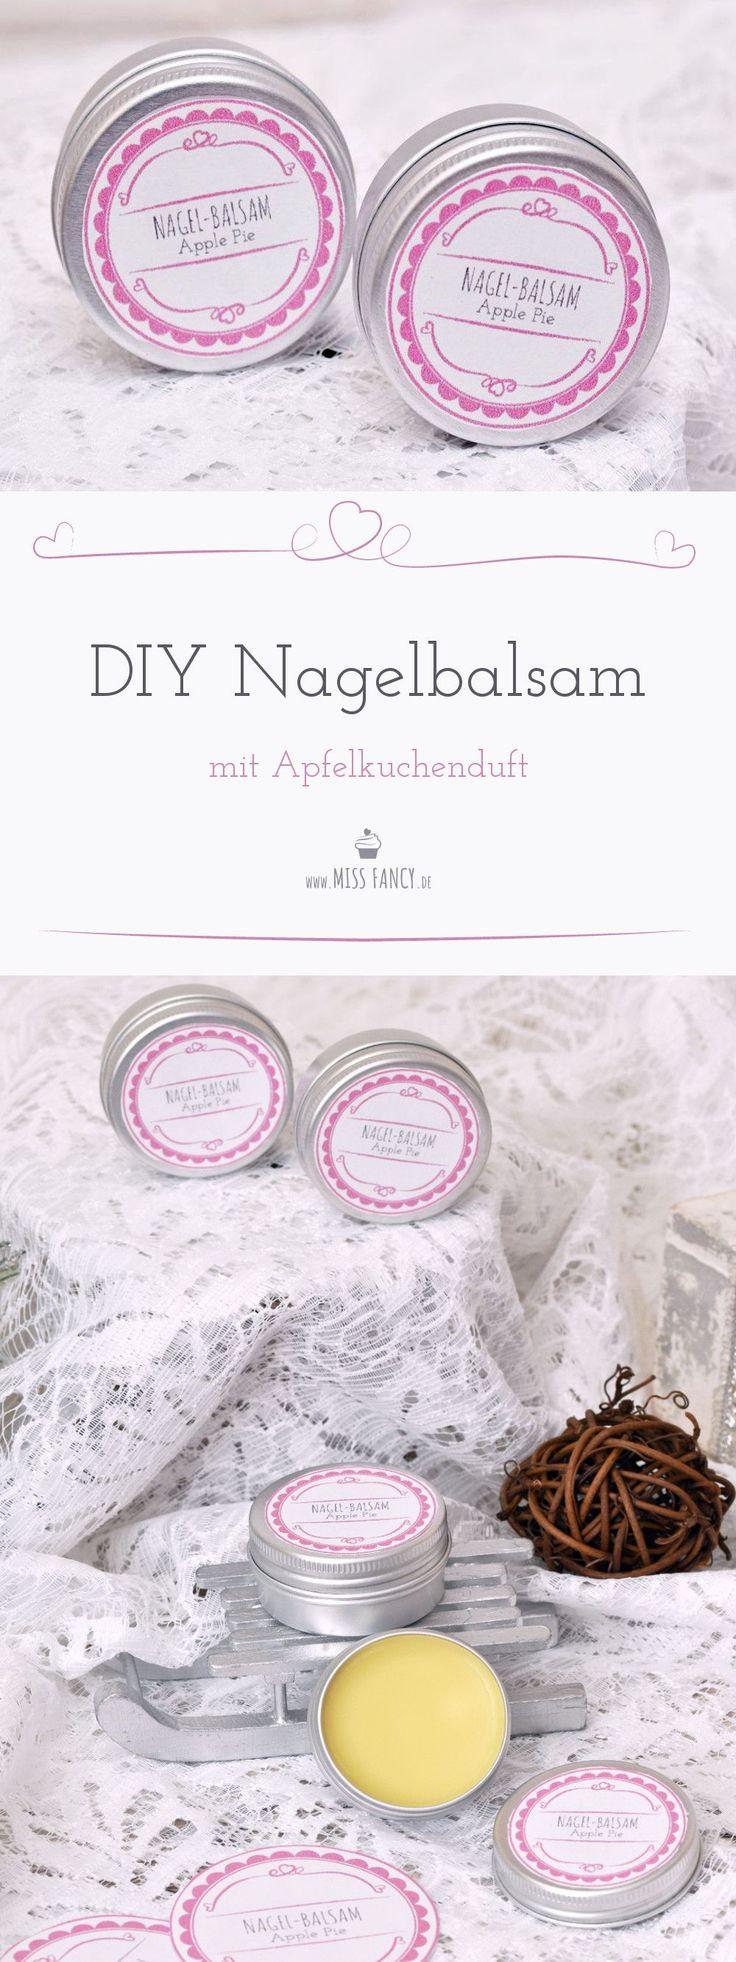 122 best Nailart & Nagelpflege images on Pinterest | Fingernail ...